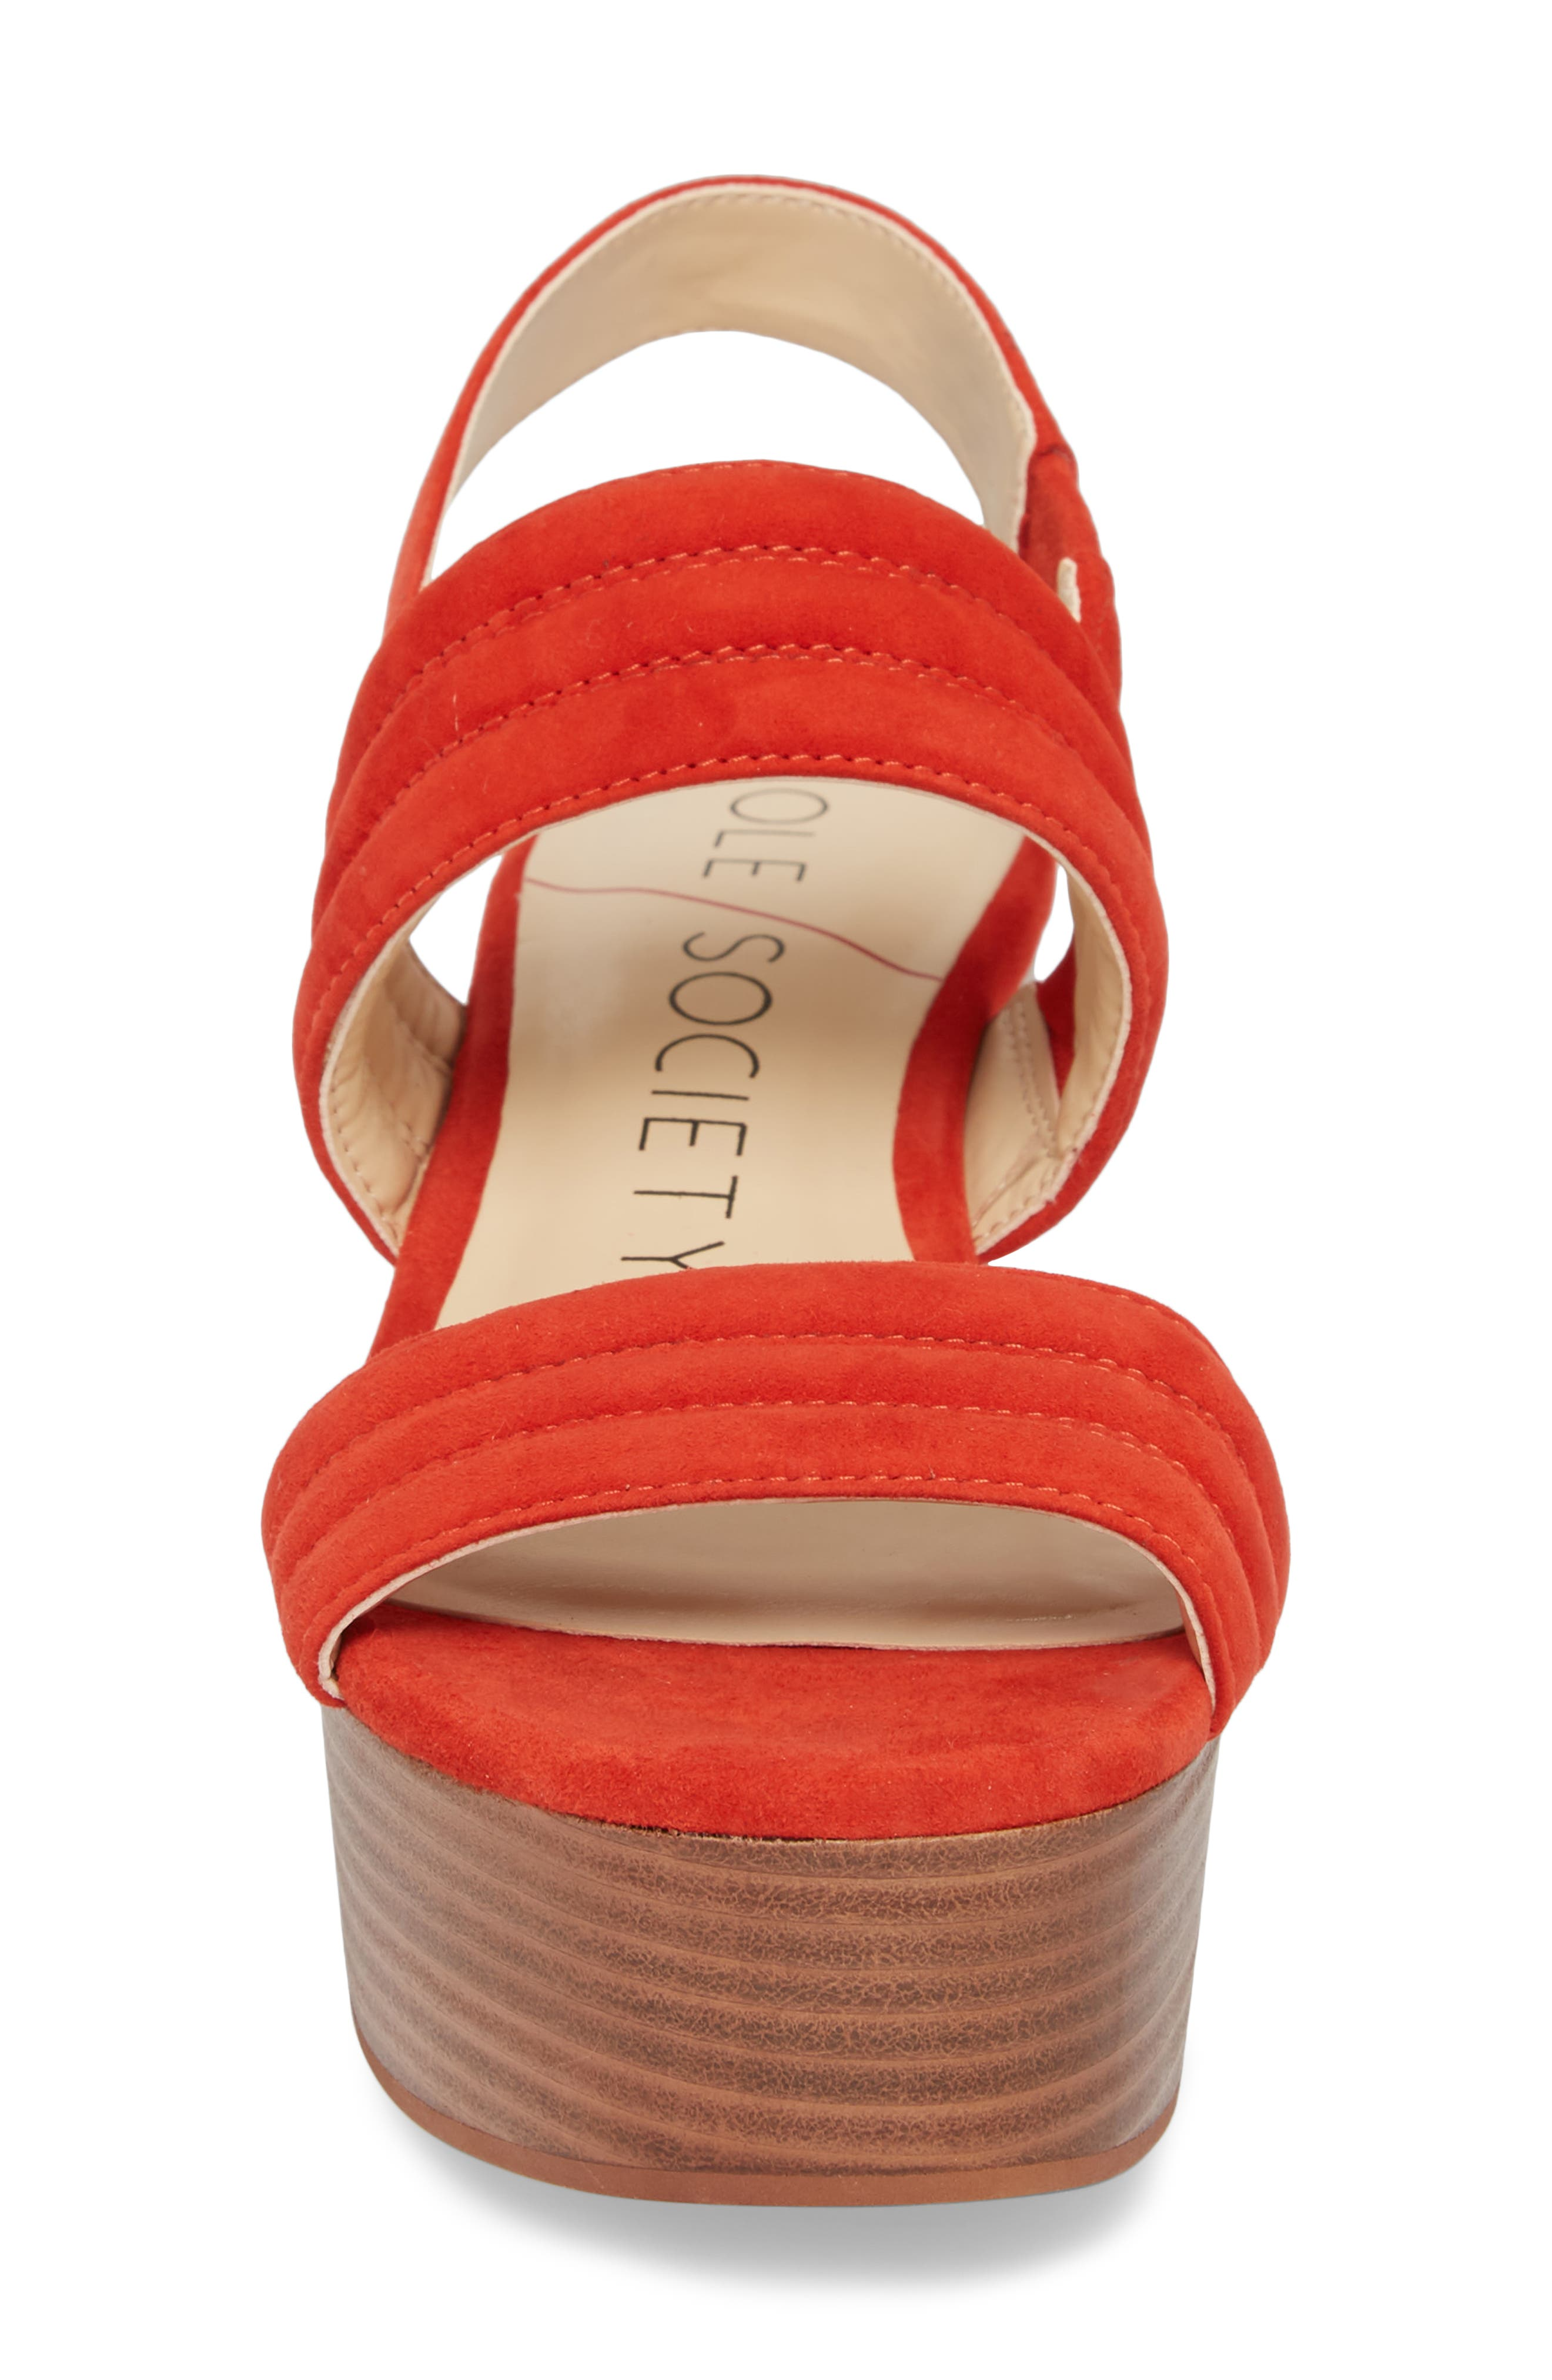 Amberly Platform Sandal,                             Alternate thumbnail 16, color,